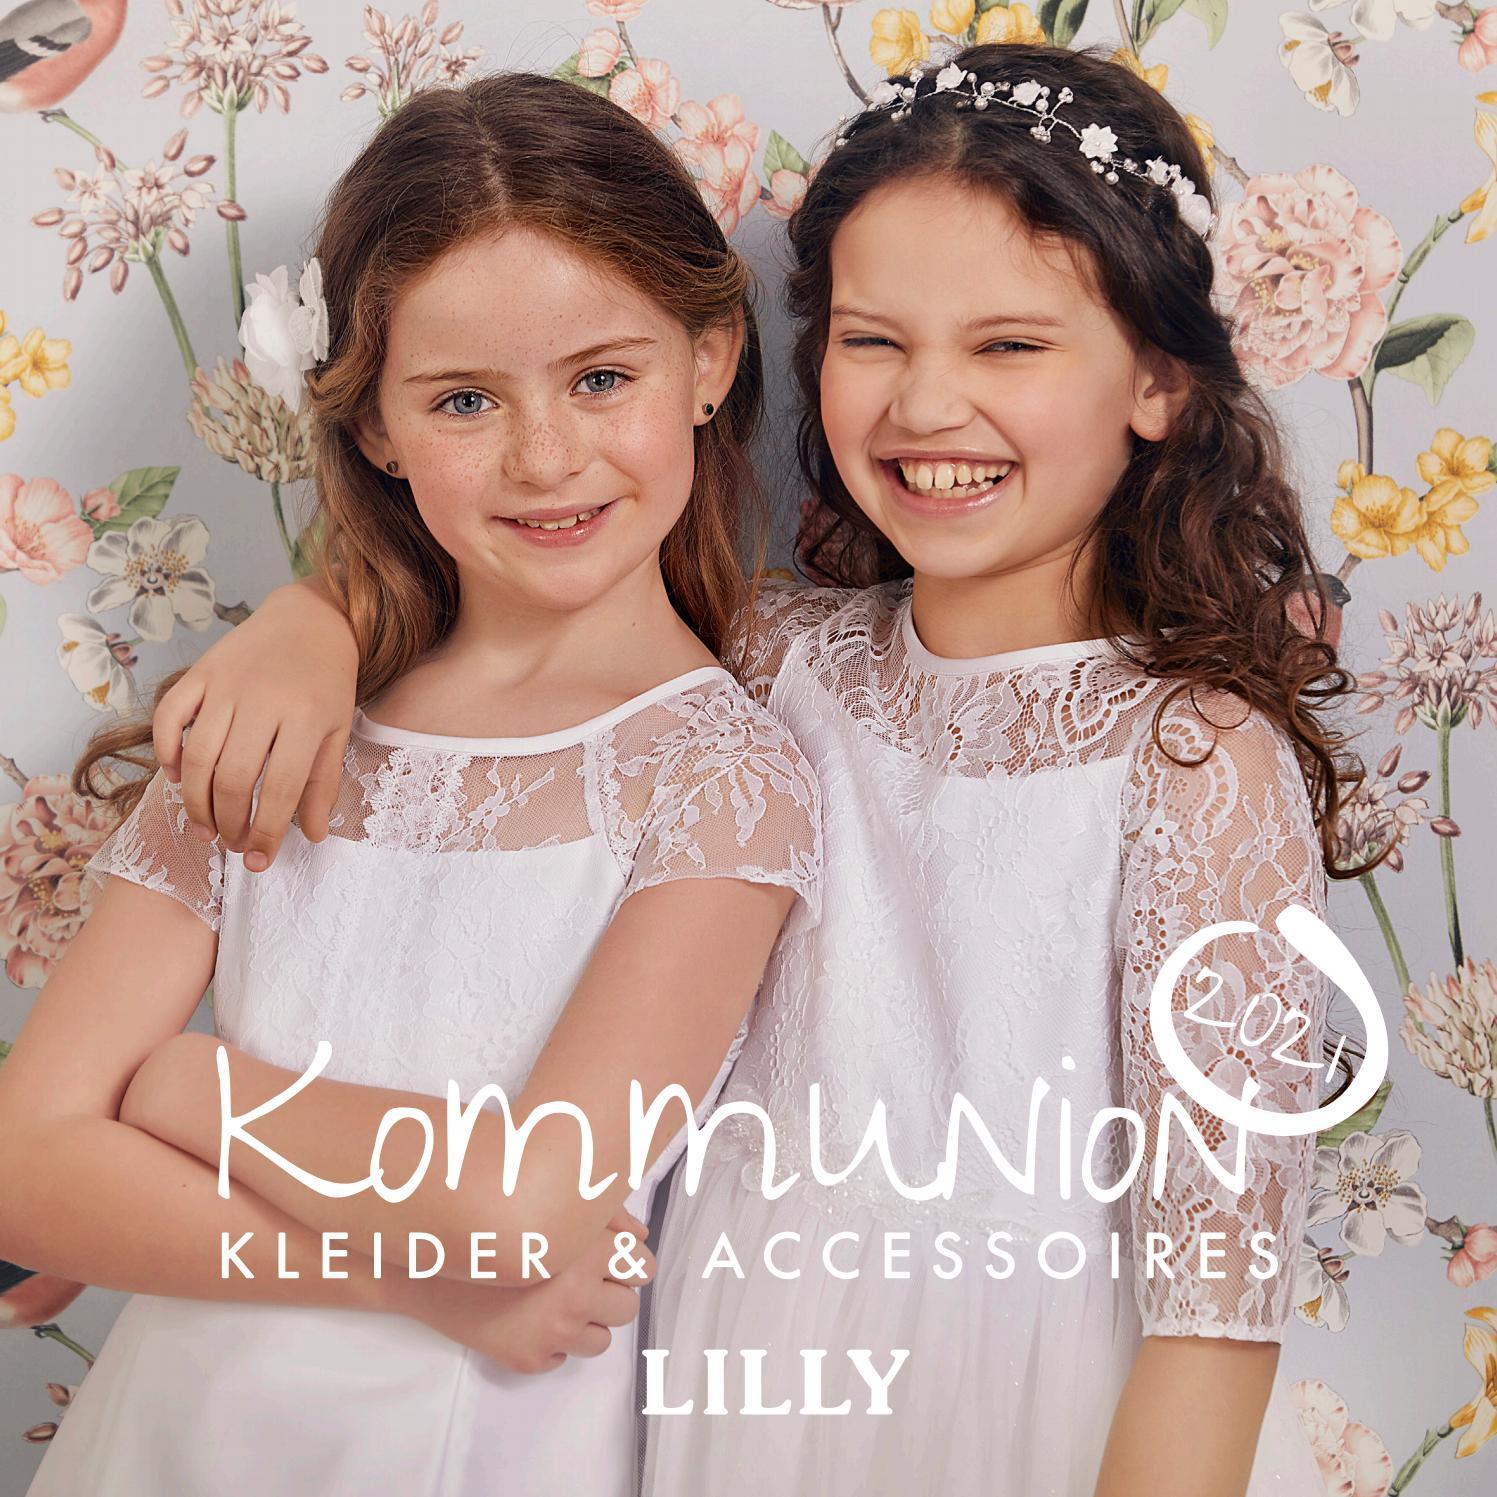 LILLY Kommunion 15 by LILLY - issuu